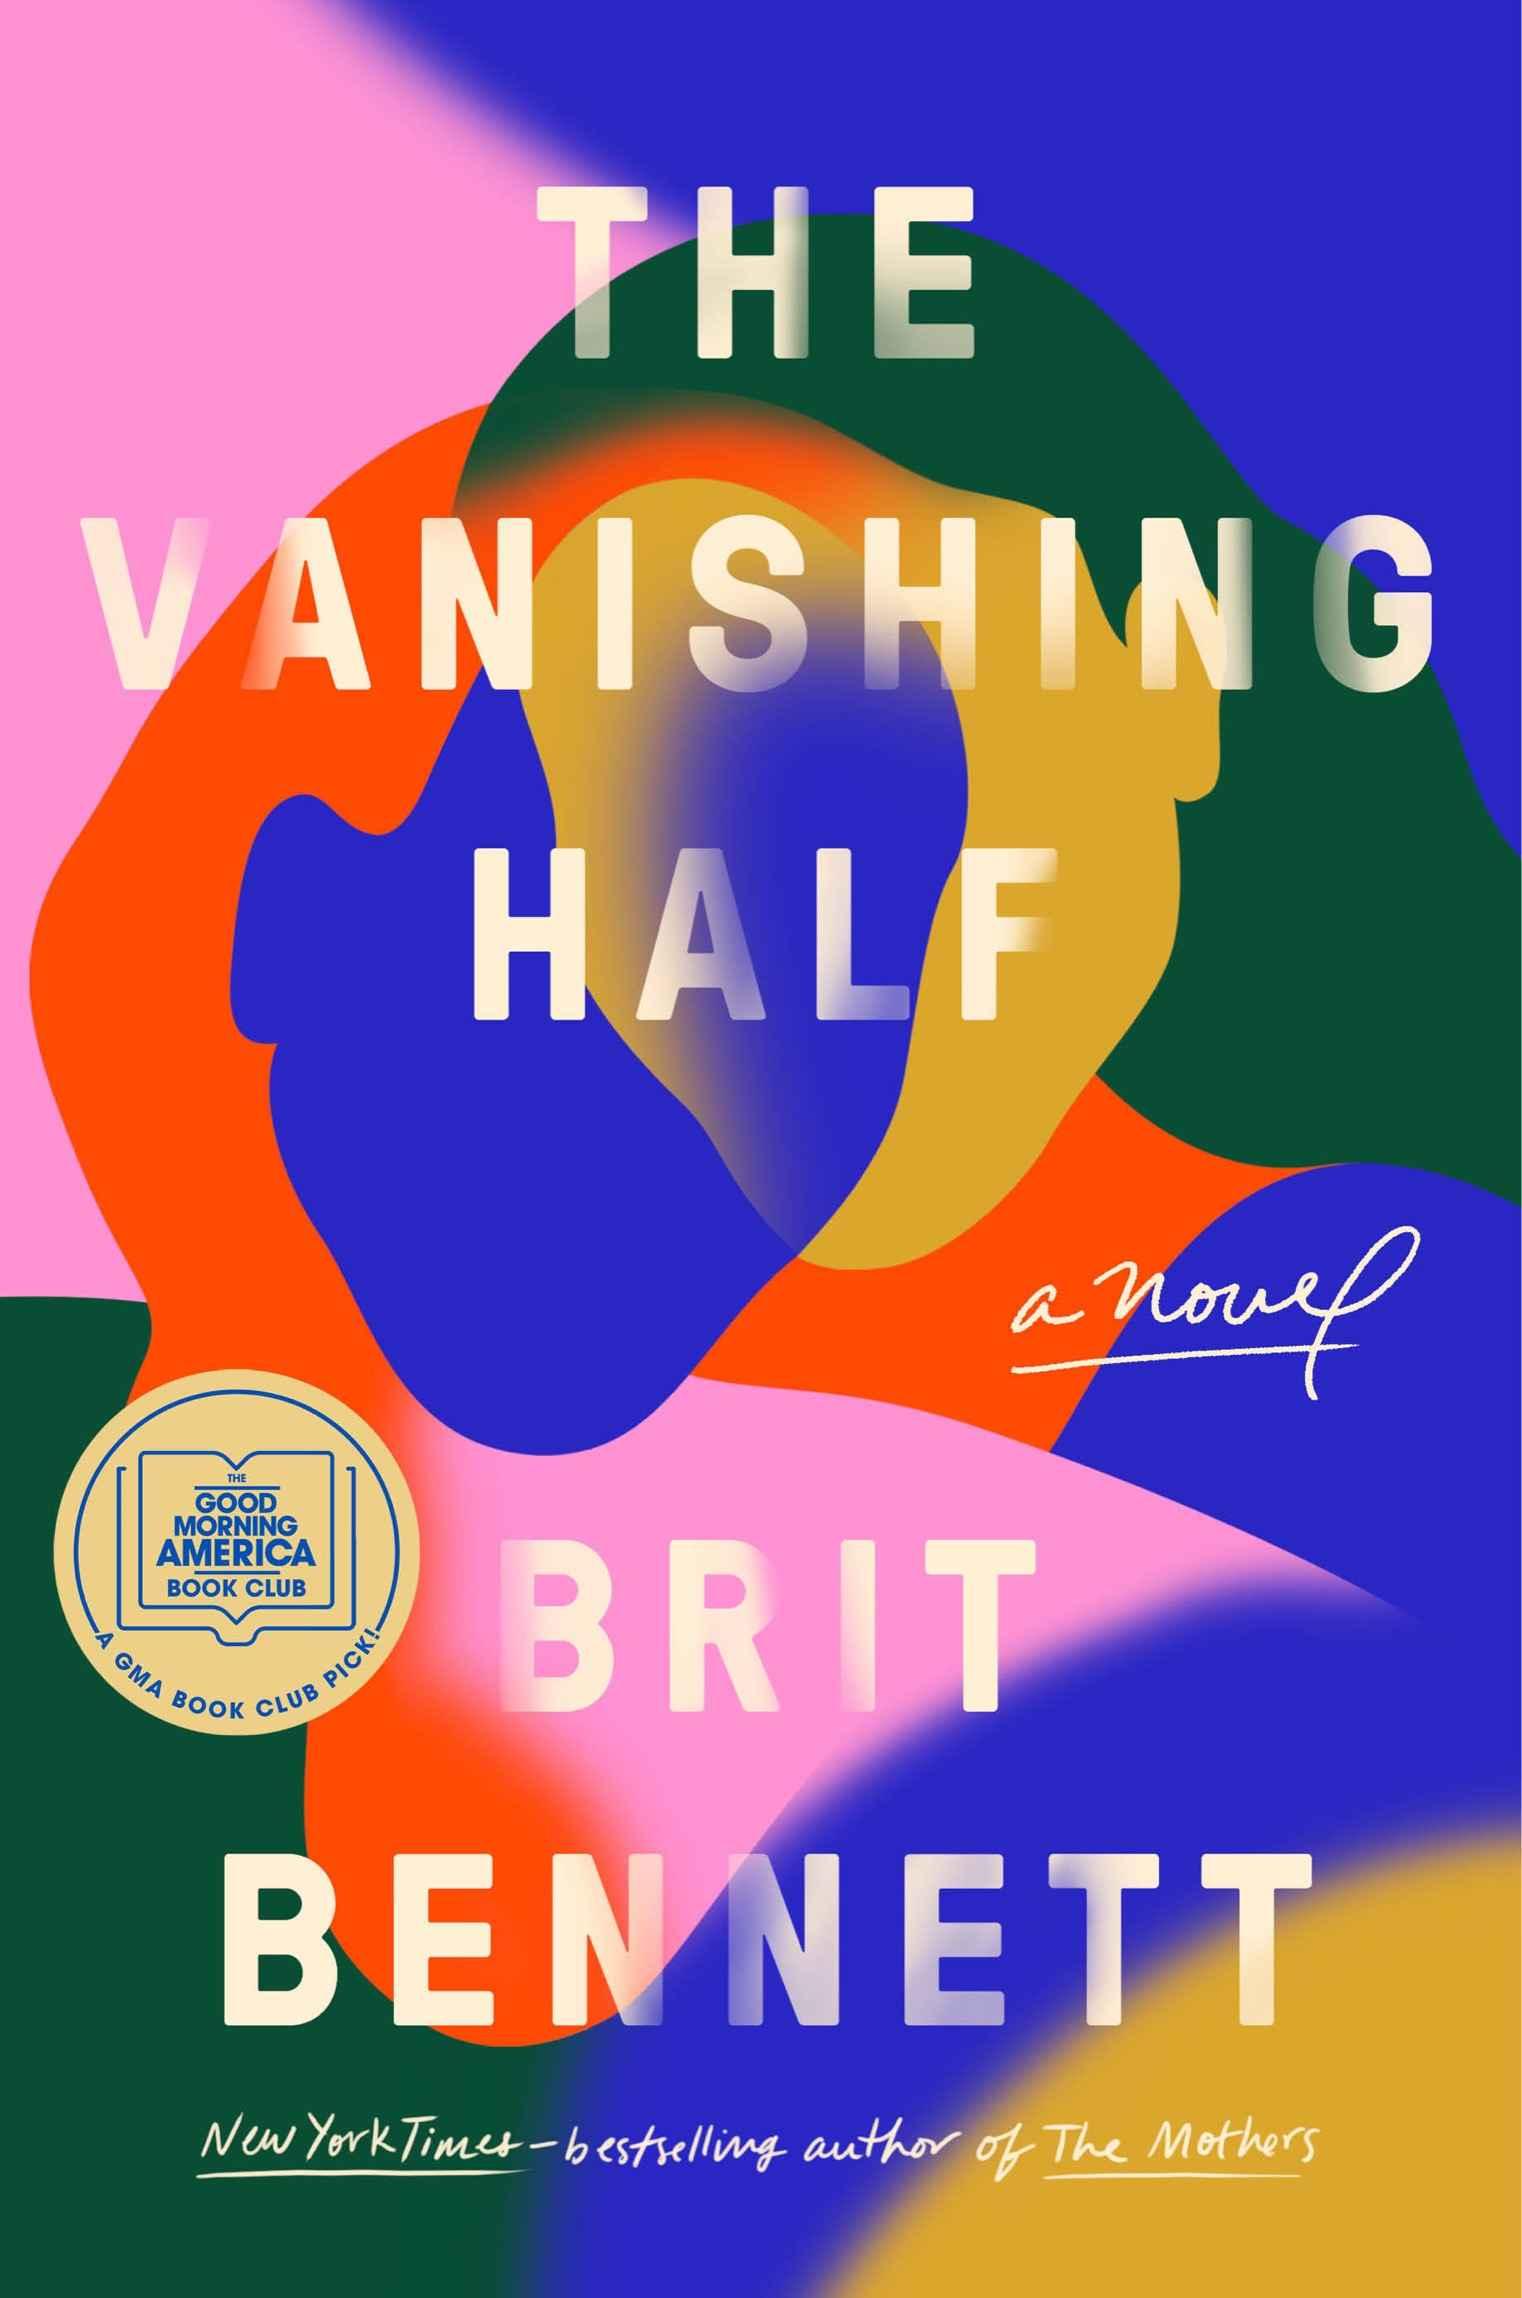 決定改變一生—–讀《The Vanishing Half》